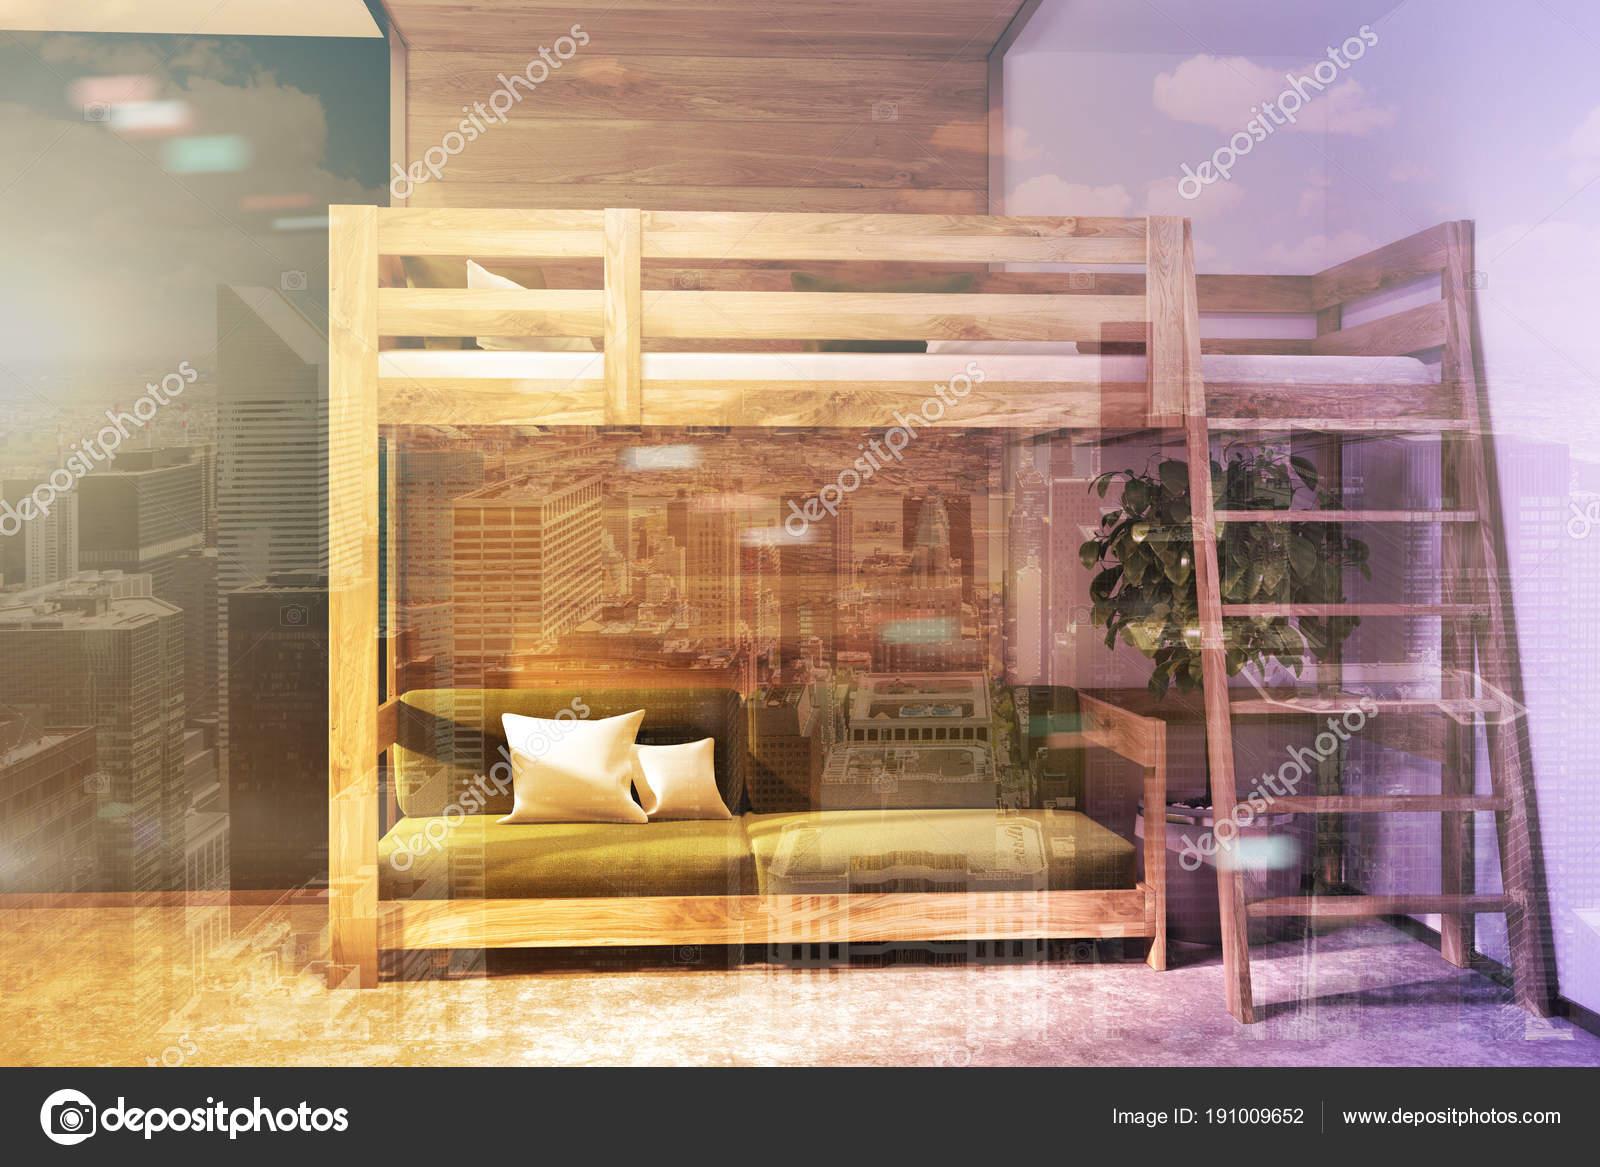 Slaapkamer Blauwe Muur : Donker blauwe muur slaapkamer groene loft bed dubbele u stockfoto